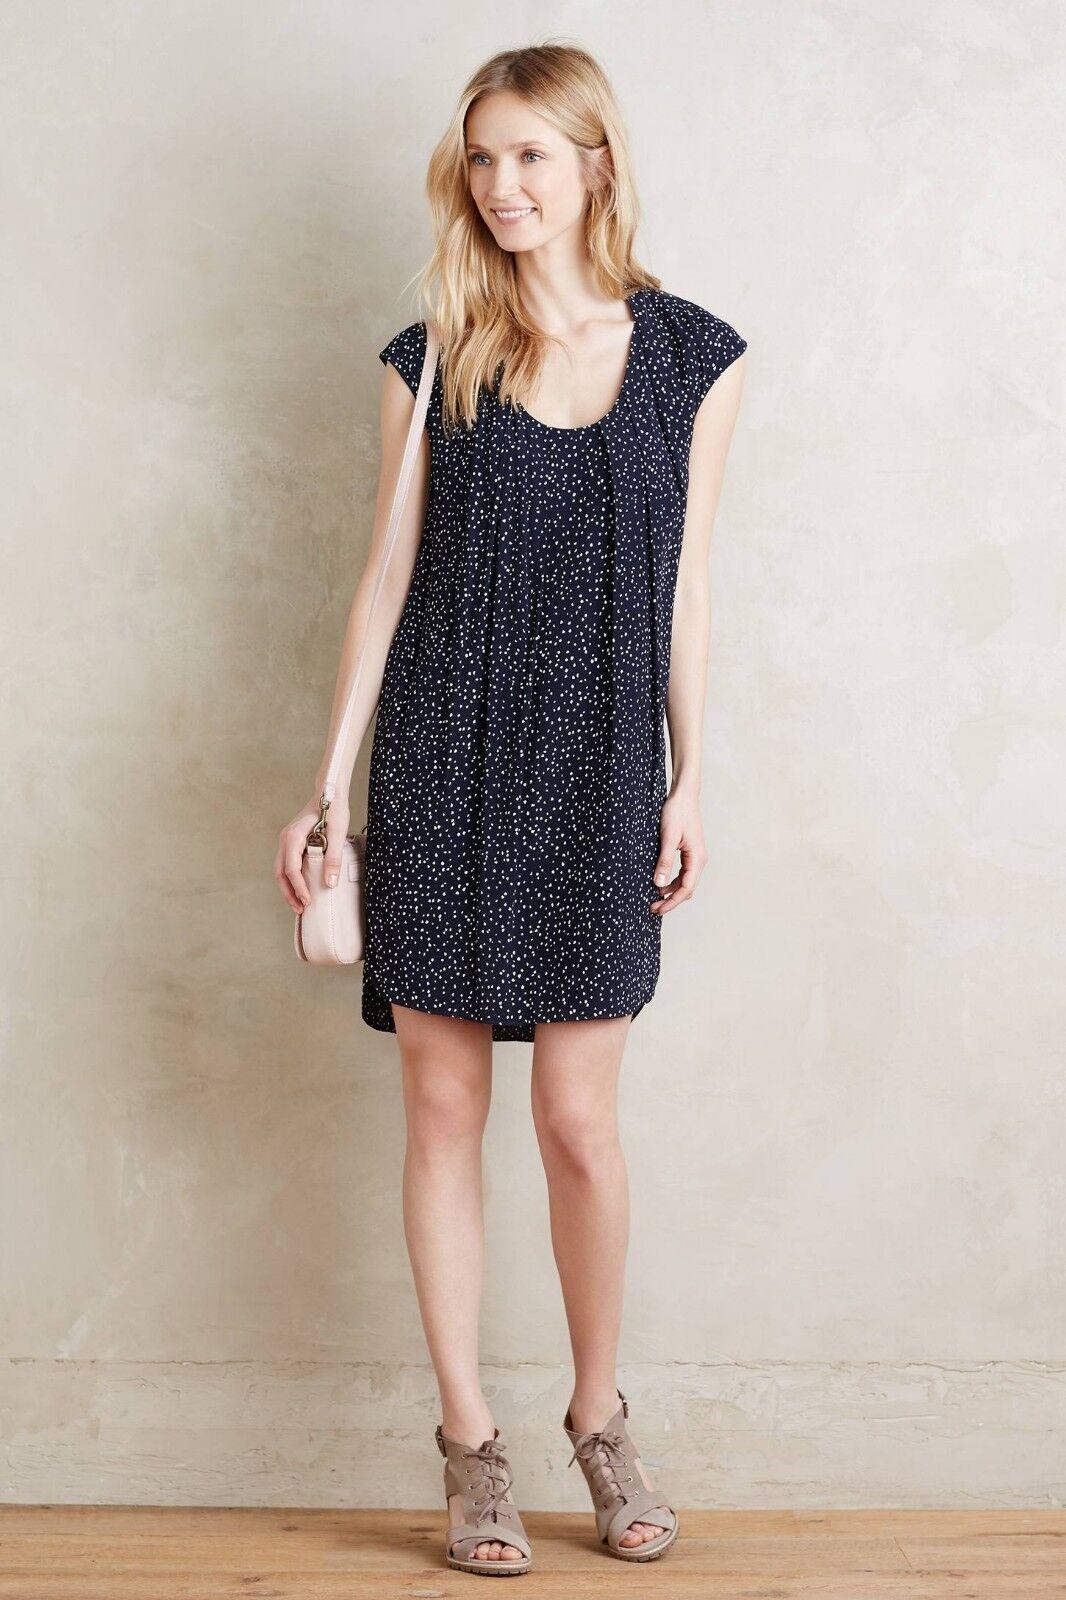 NWT Anthropologie Au Revoir Dress by Maeve Navy Size 2